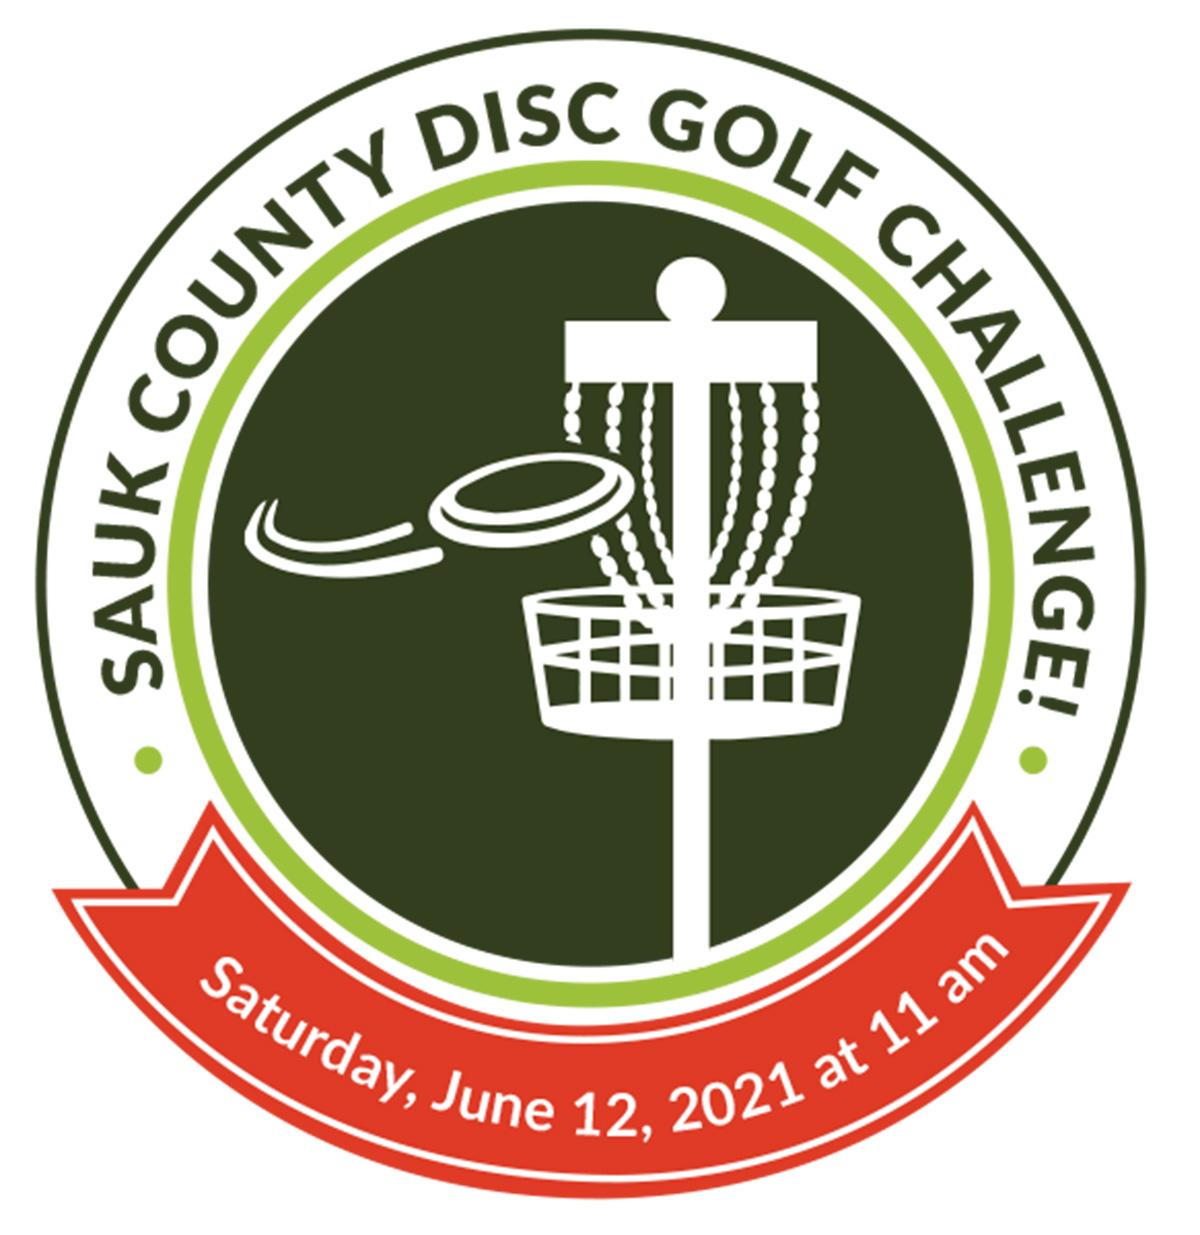 It's Golf Season – And Disc Golf Season!